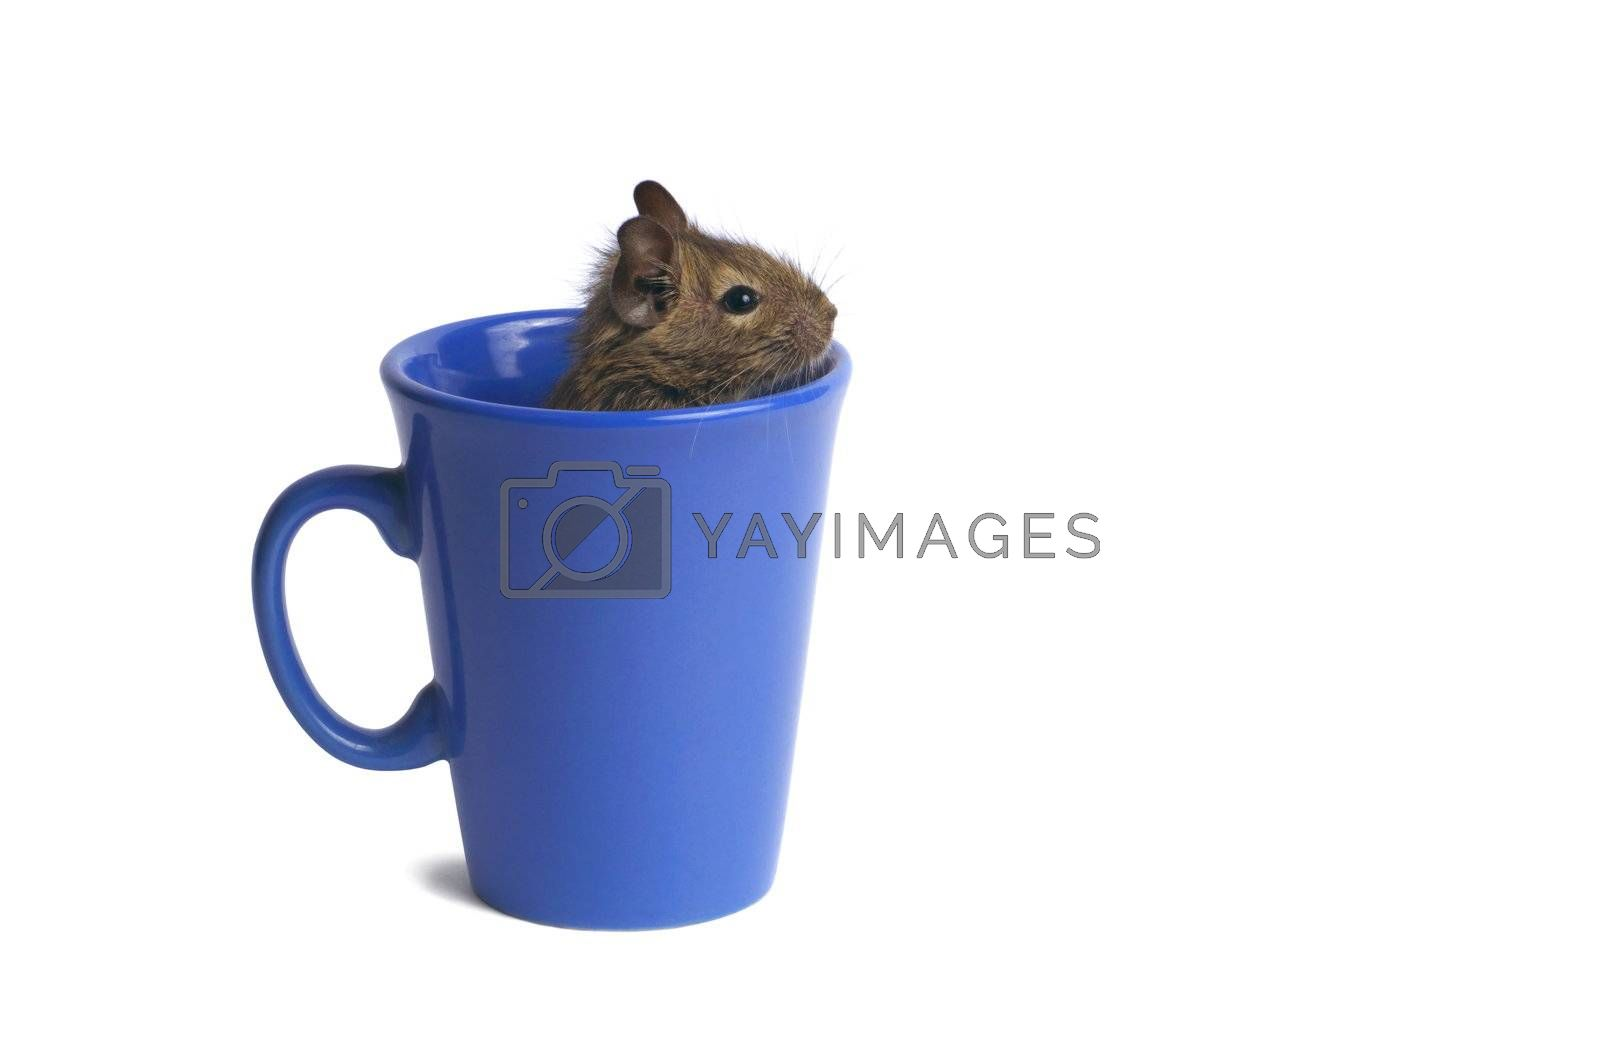 Macro of a mug with degu inside isolated on white